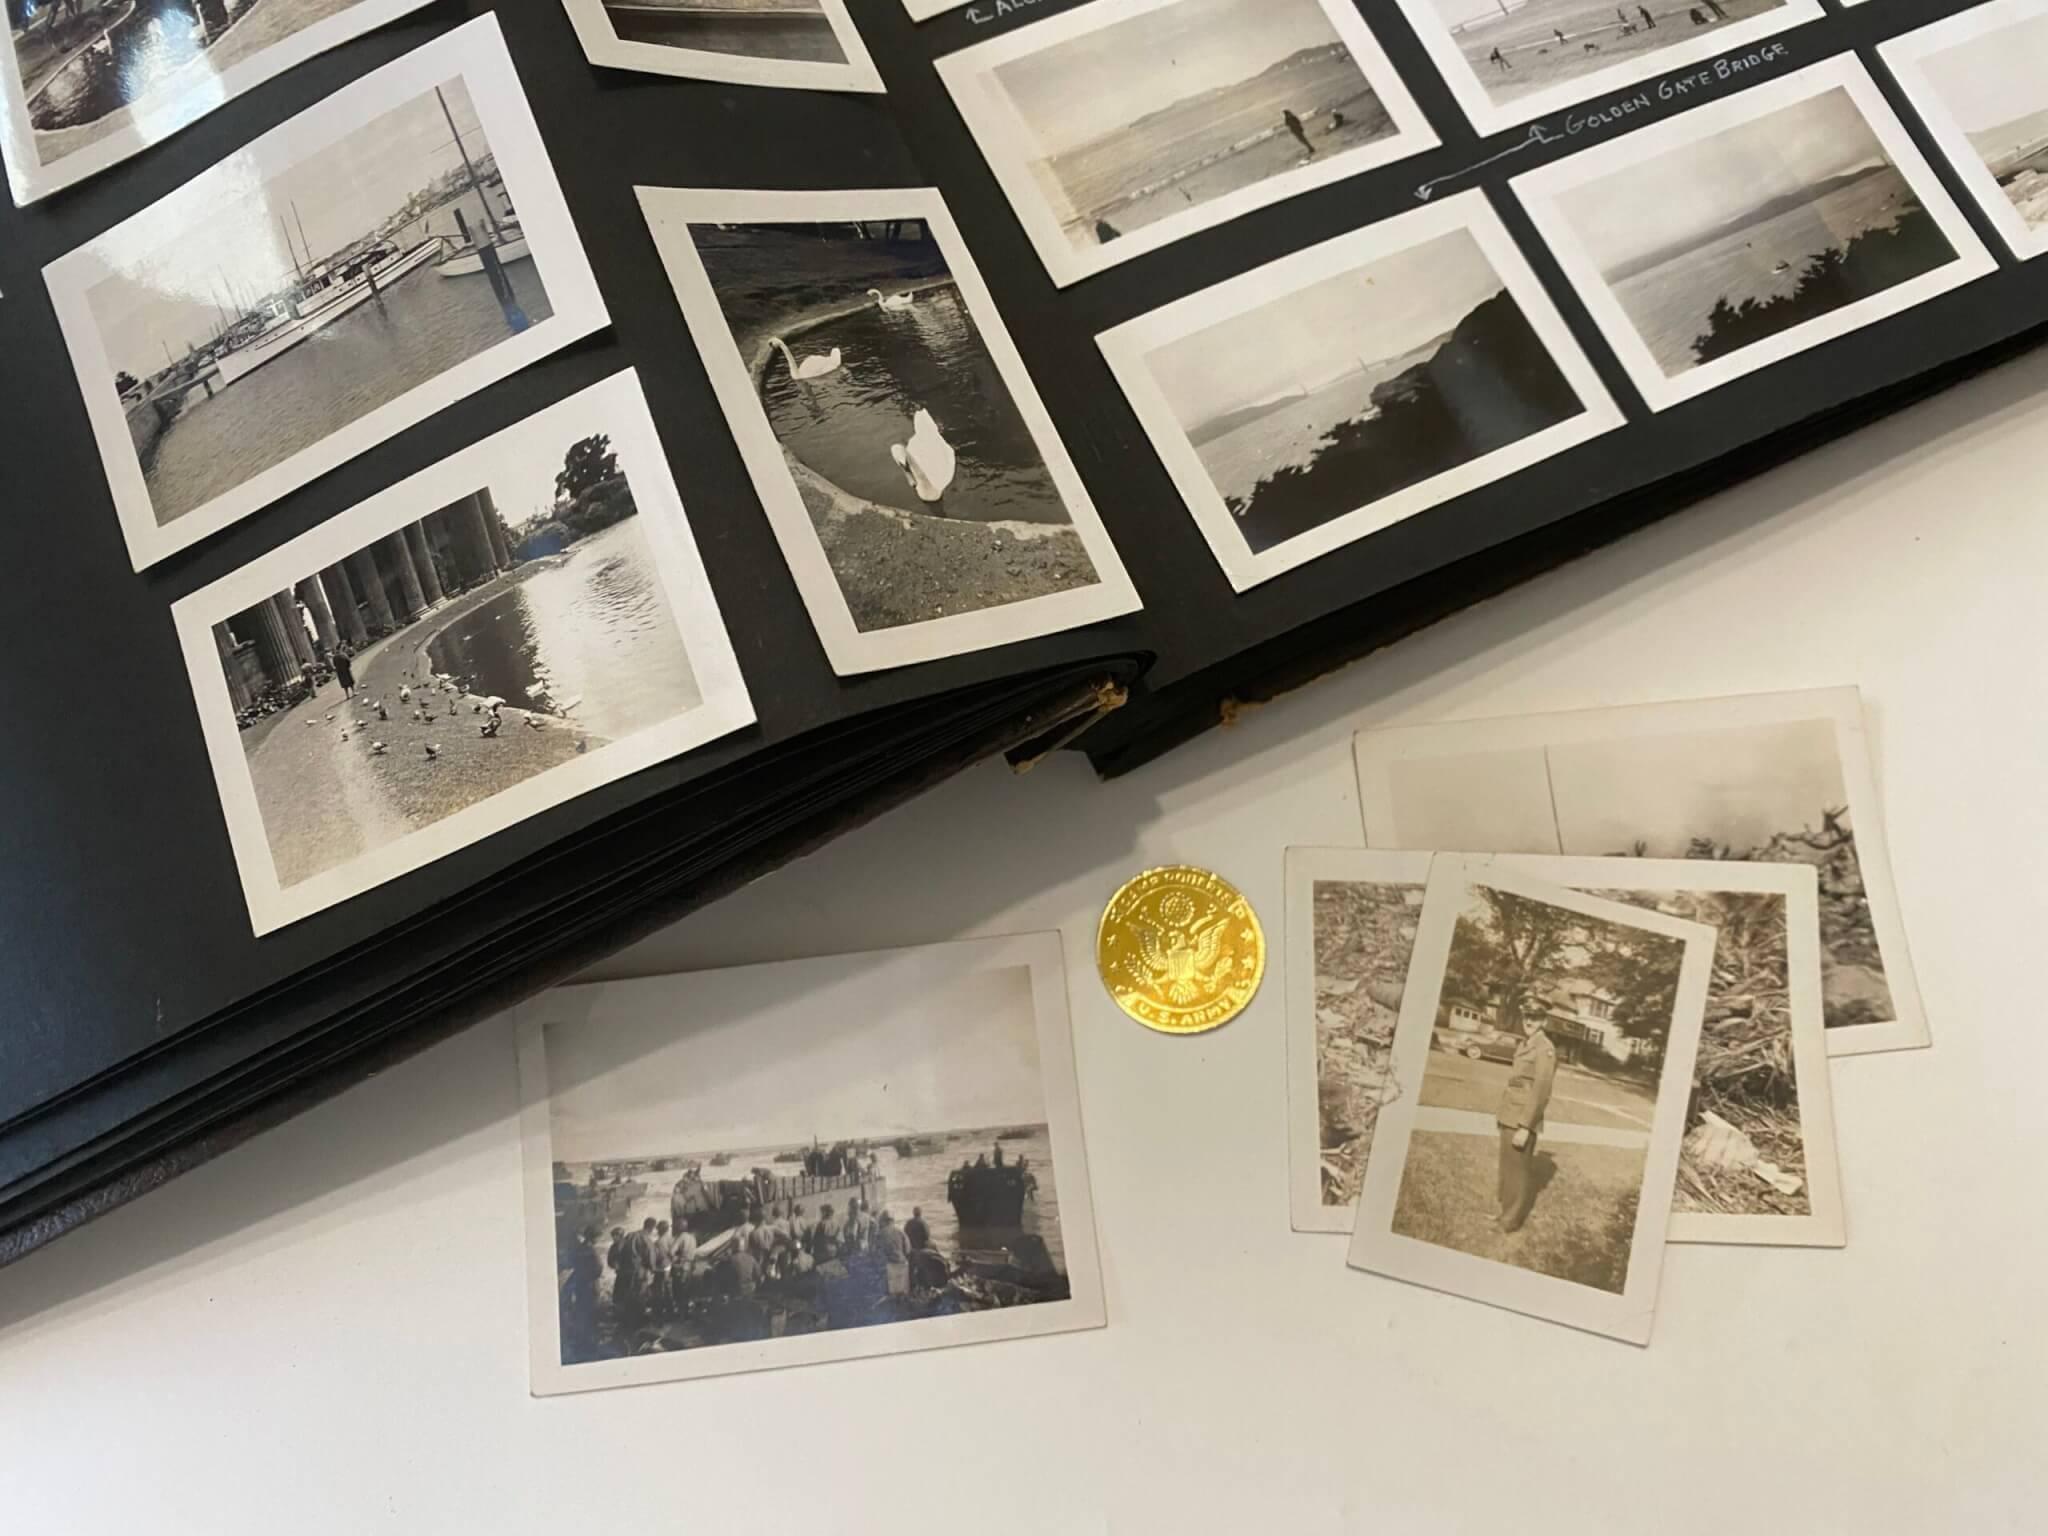 Heirlooms, Books, scrap books, photographs, drawings conservation, restoration, repair, preservation